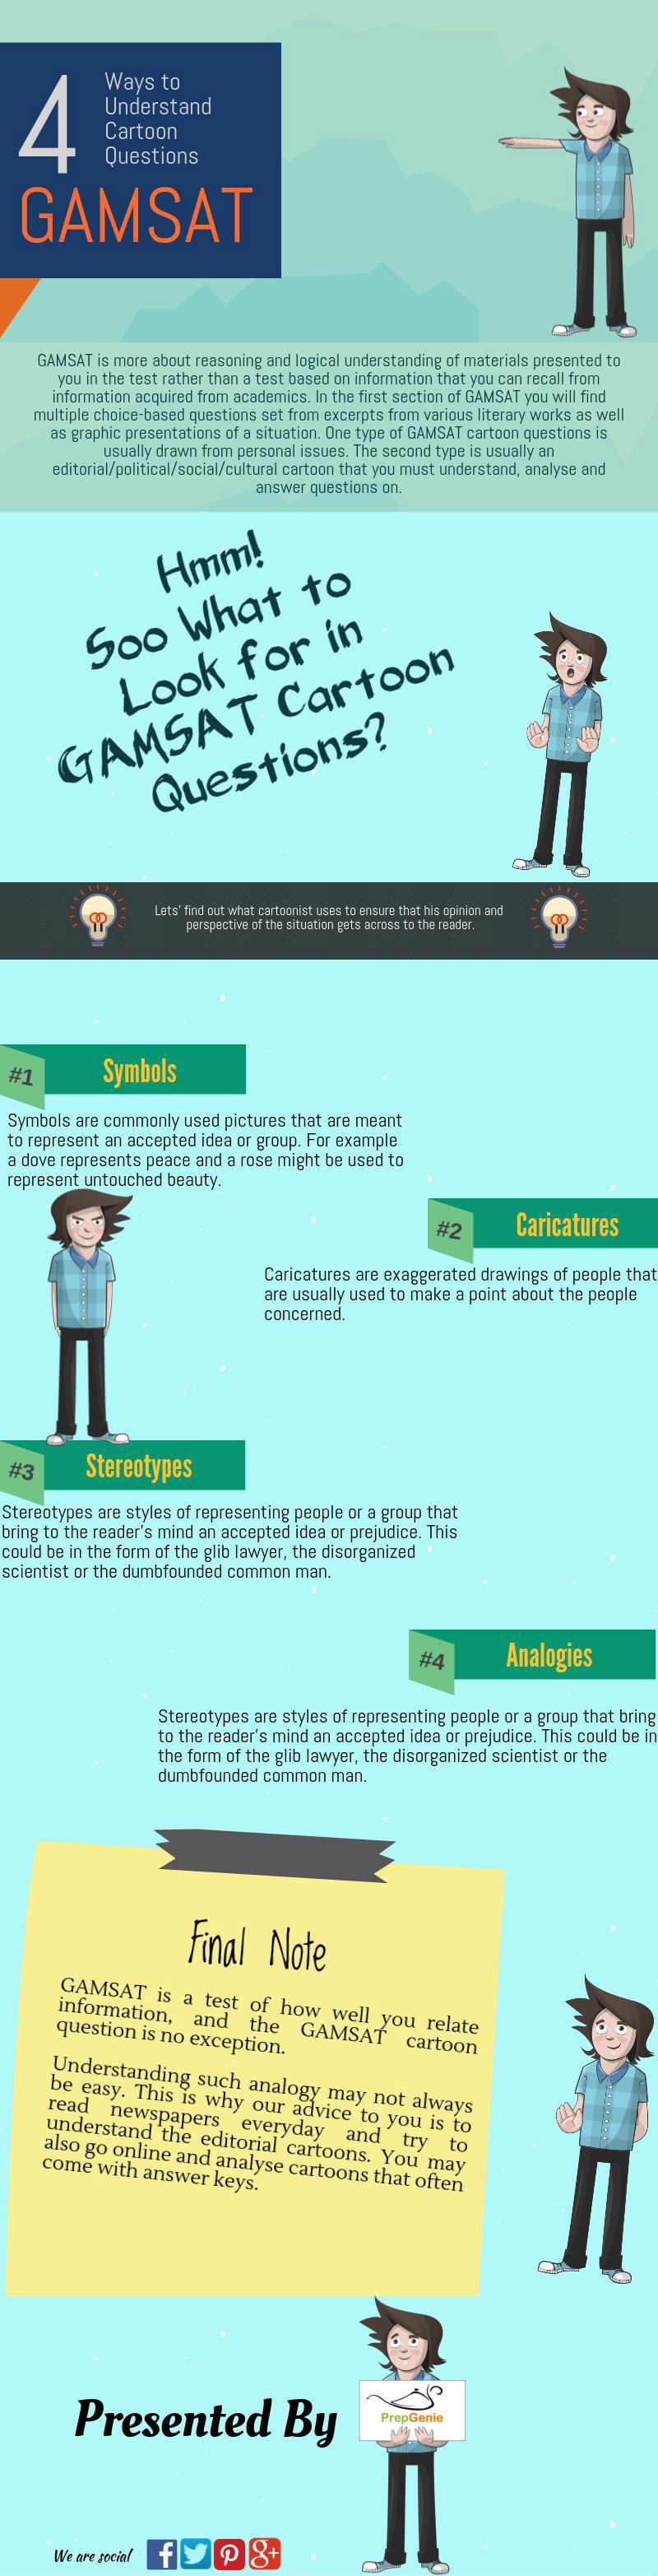 4 Ways To Understand Gamsat Cartoon Questions Medical School